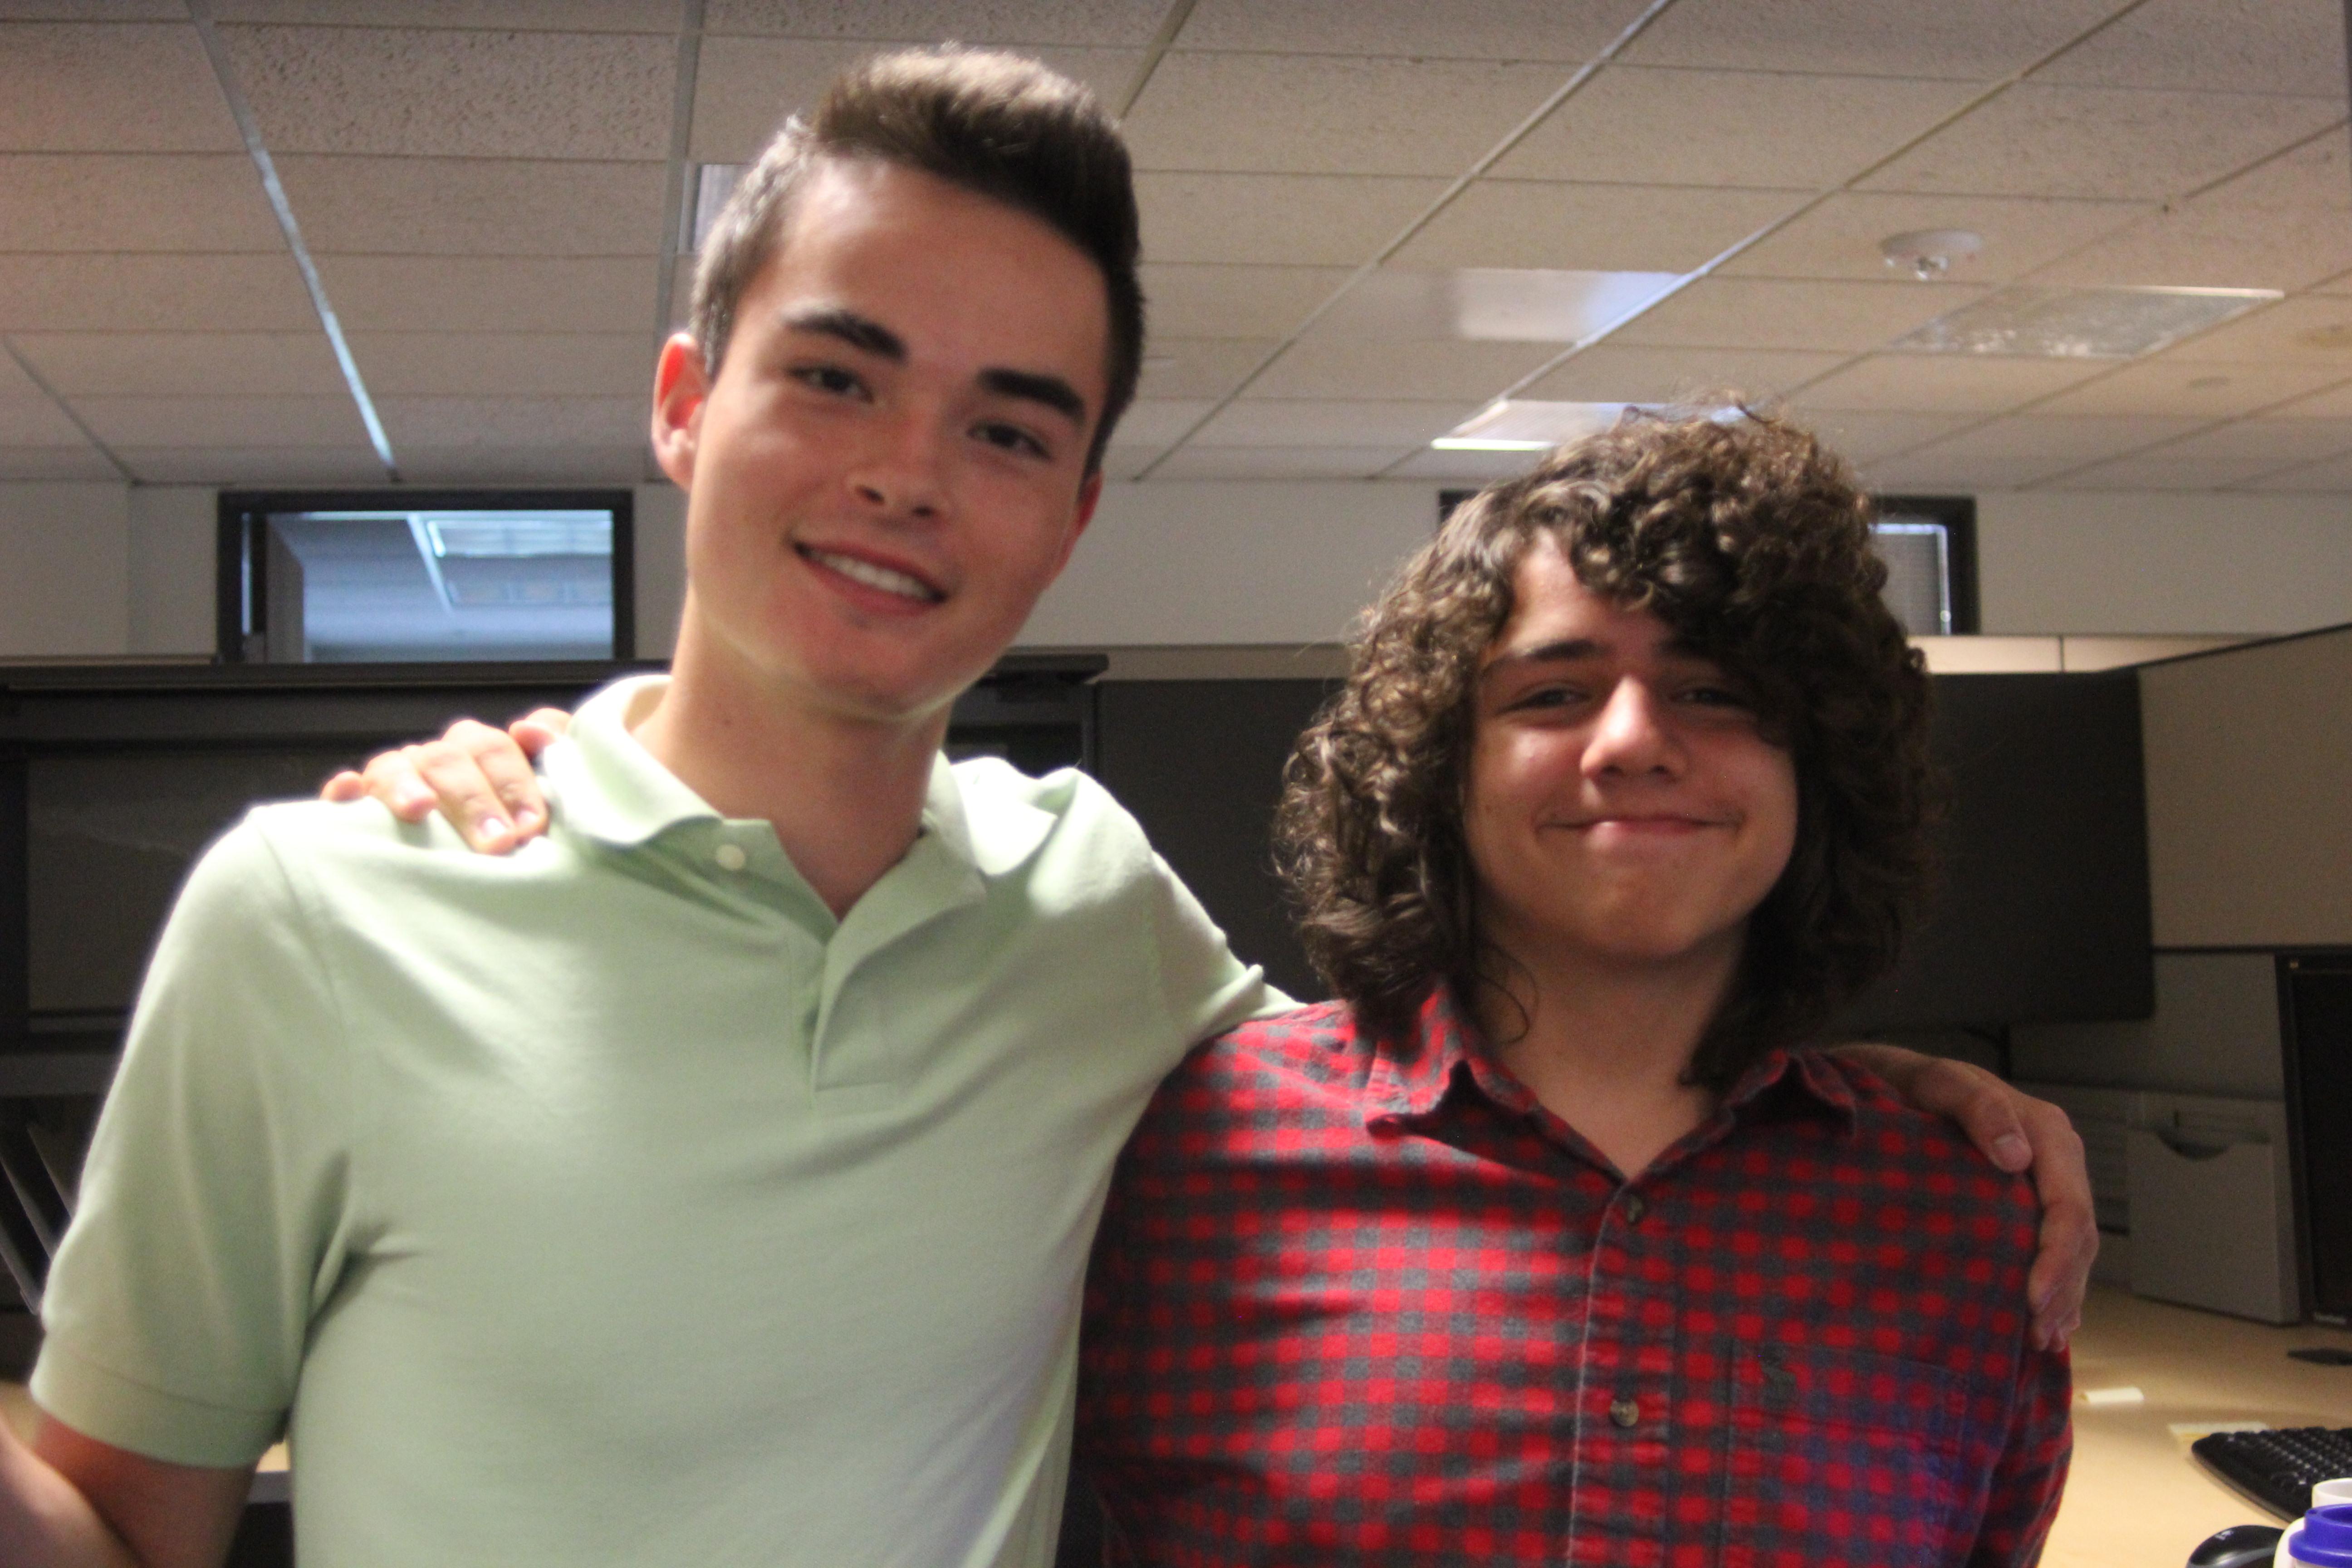 DPS students Jake VanSickle and Carlos Yosten at Woolpert's office.